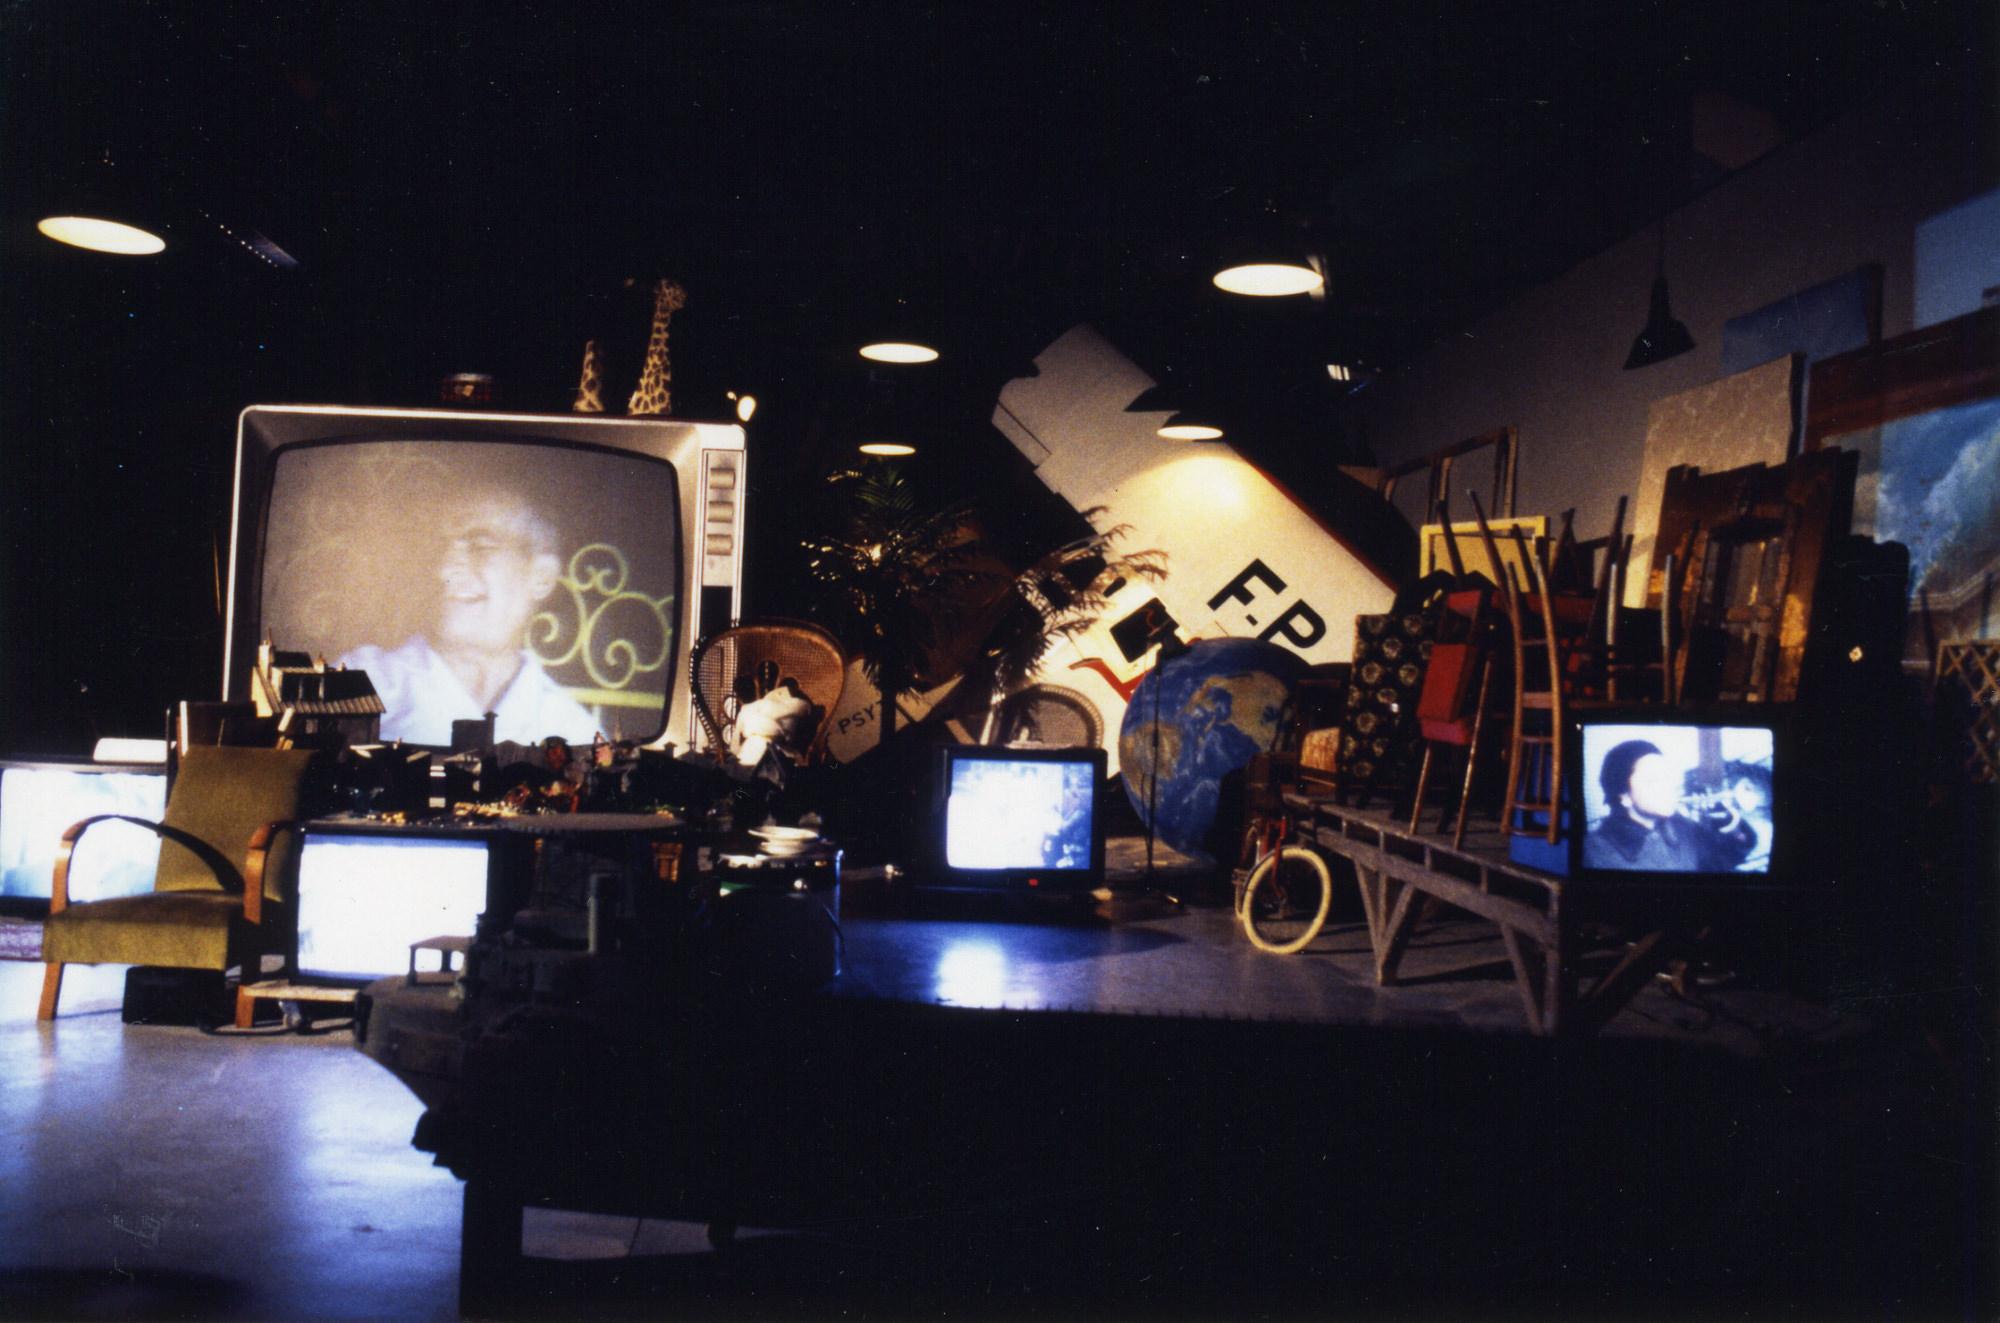 image-studio035